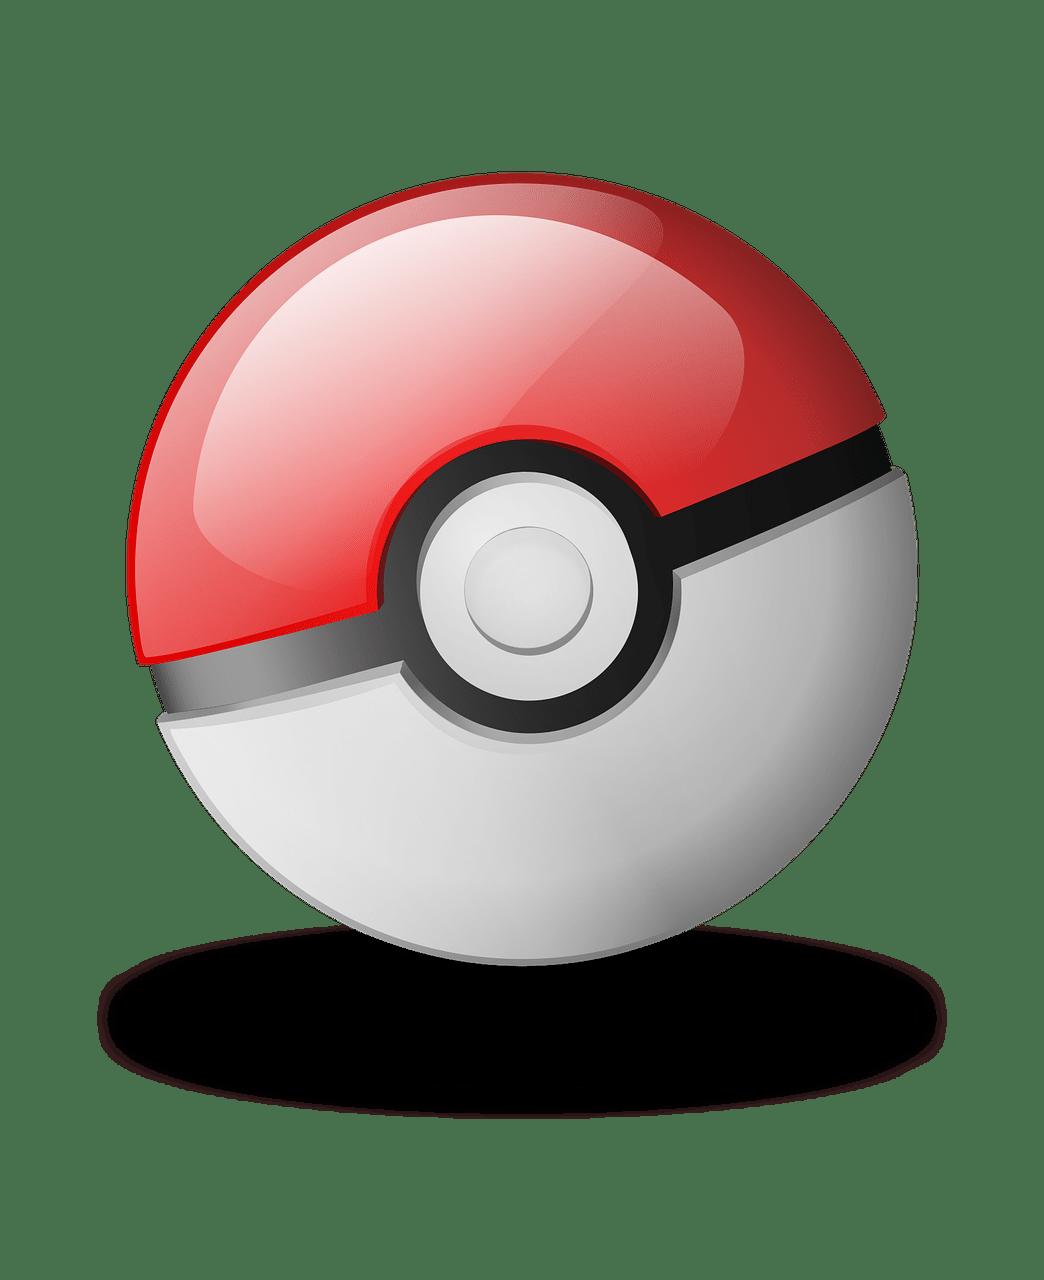 pokemon pokeball transparent png stickpng